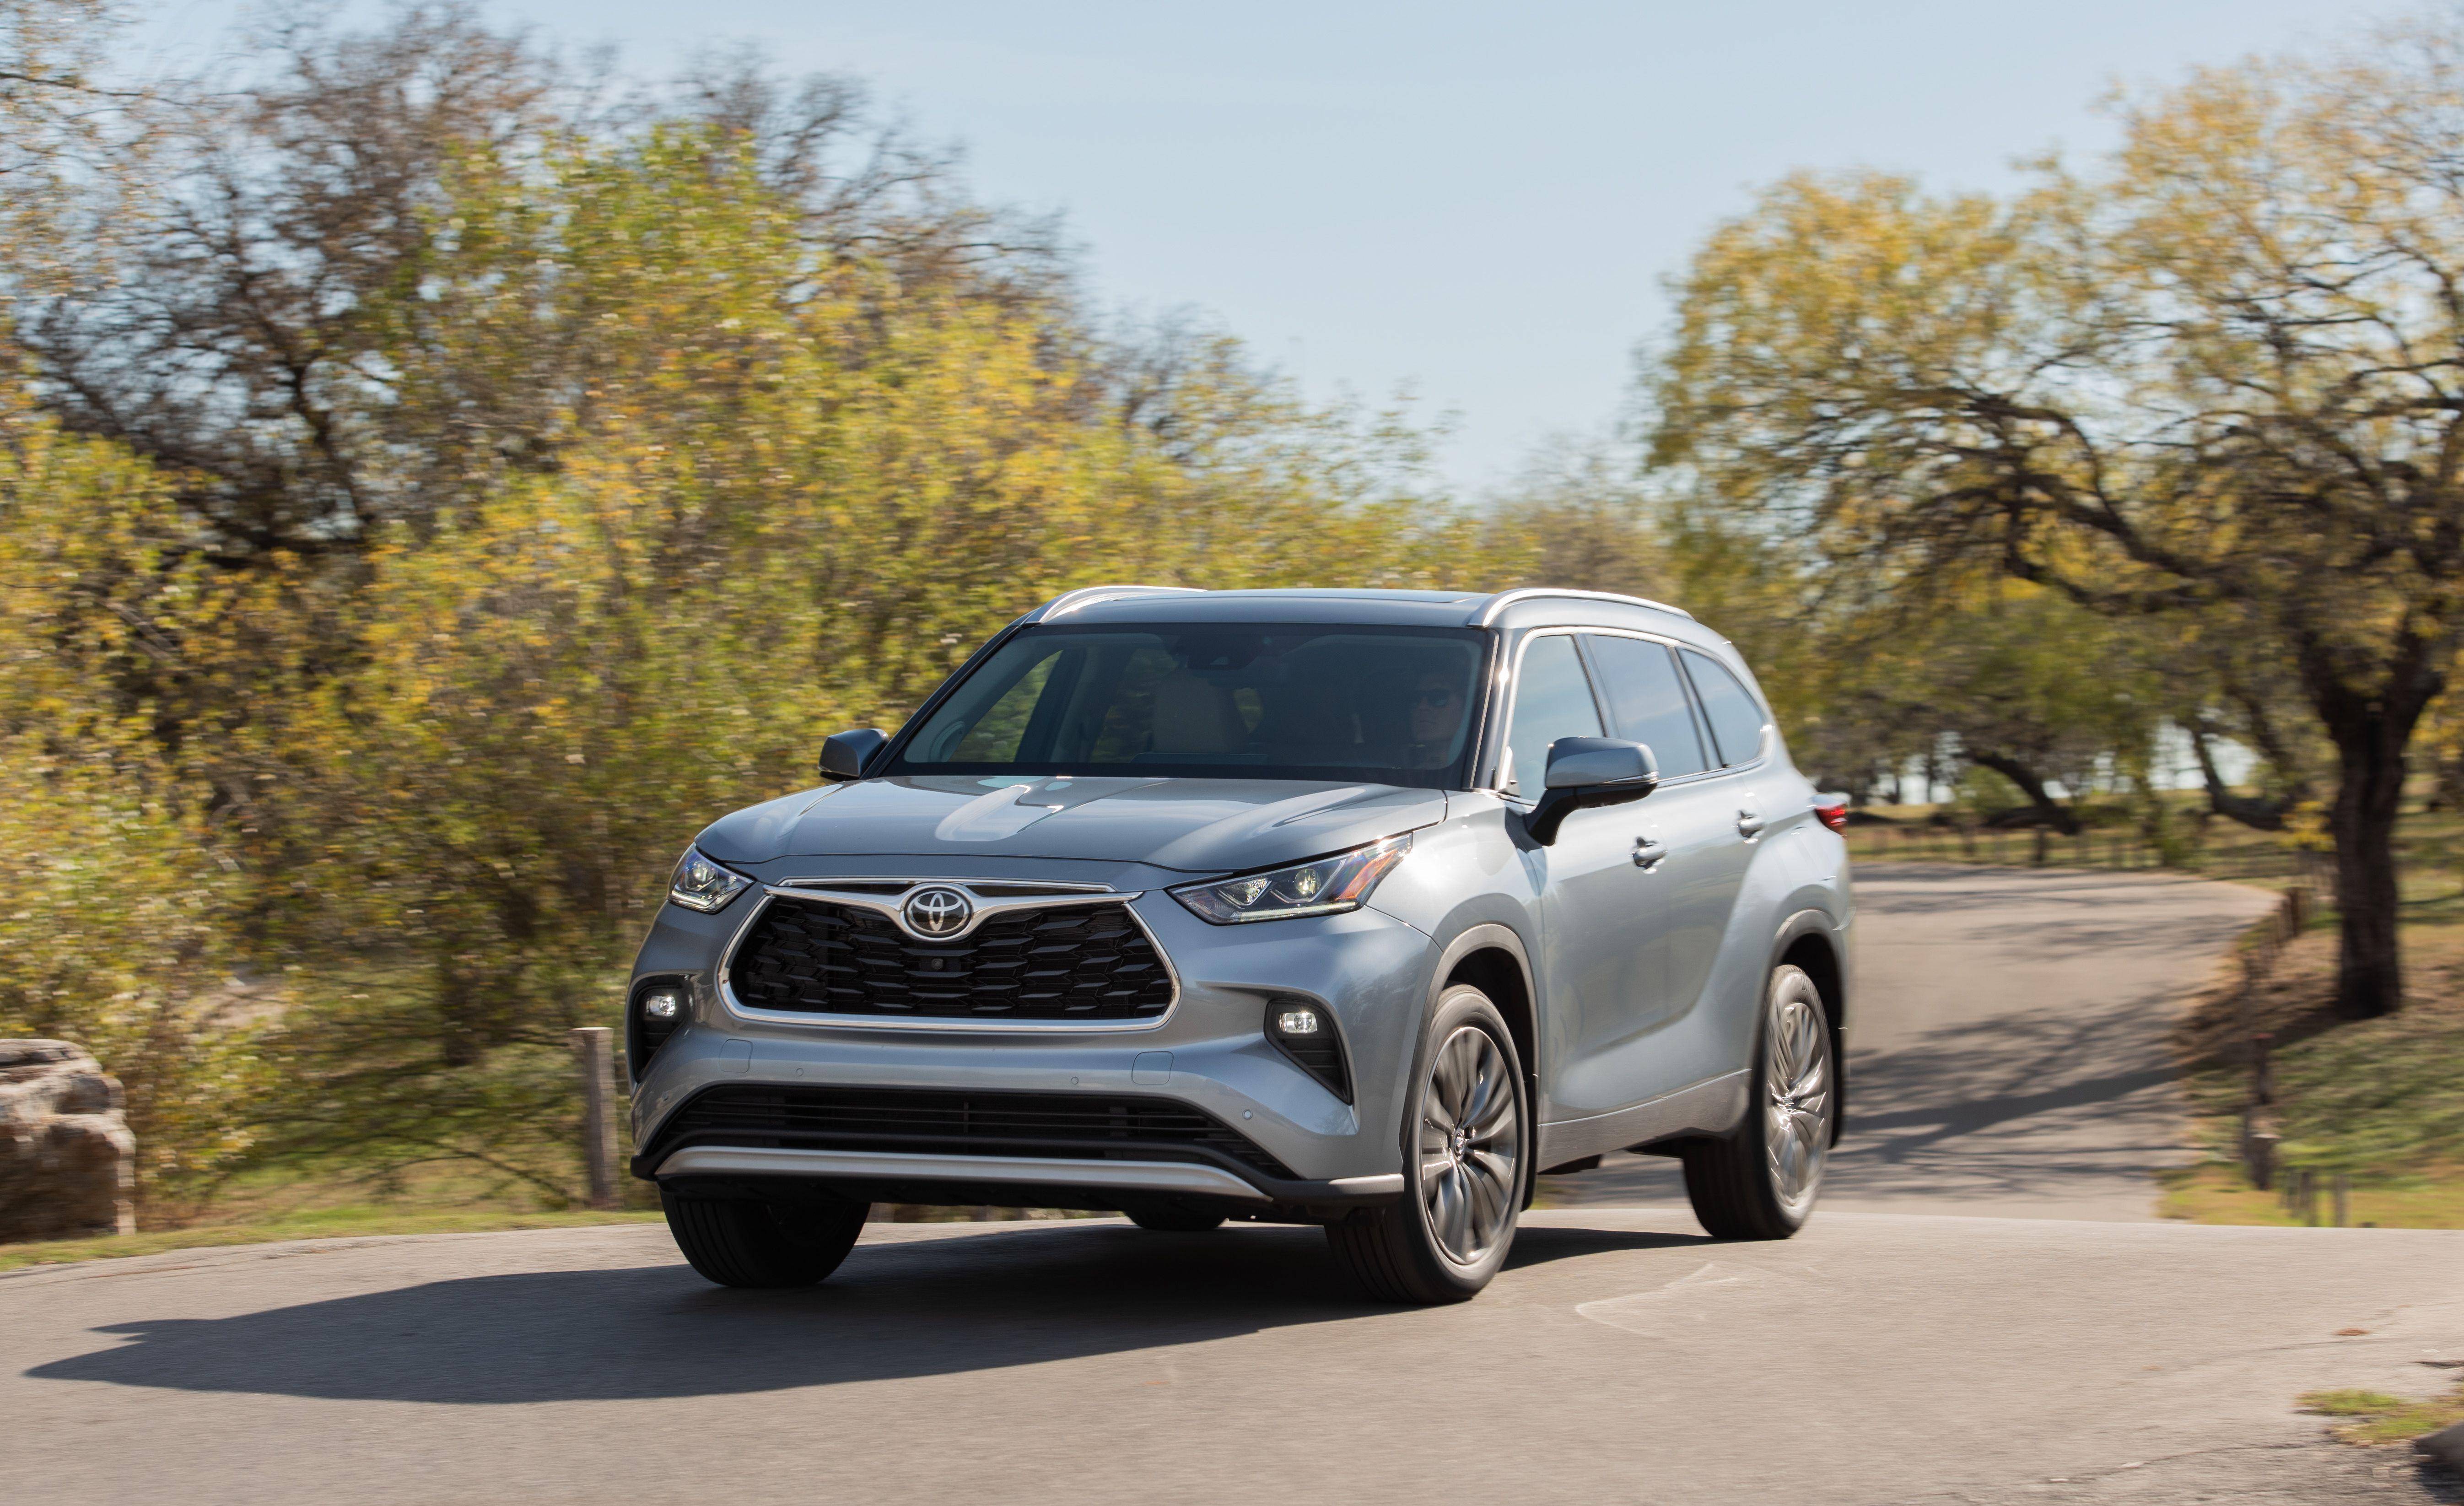 2020 Toyota Highlander Highlander Hybrid Review Pricing And Specs